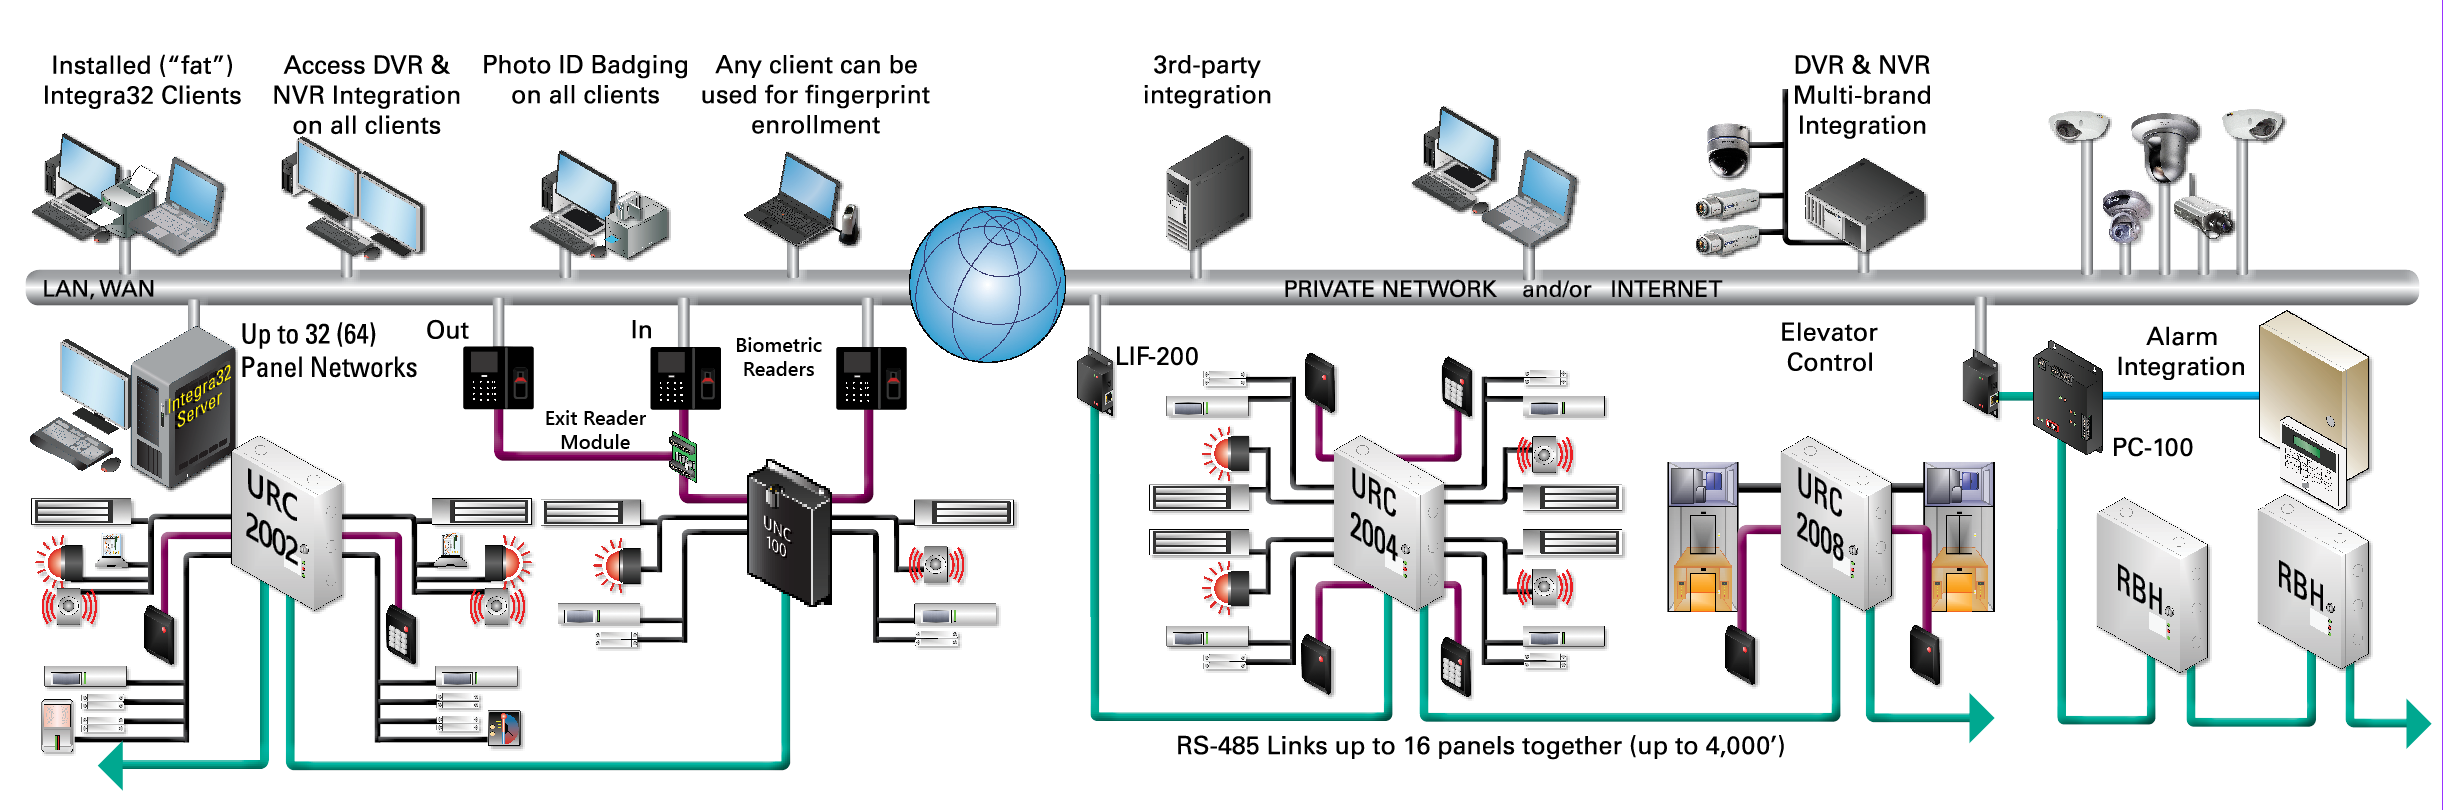 Integra32_diagram_fs